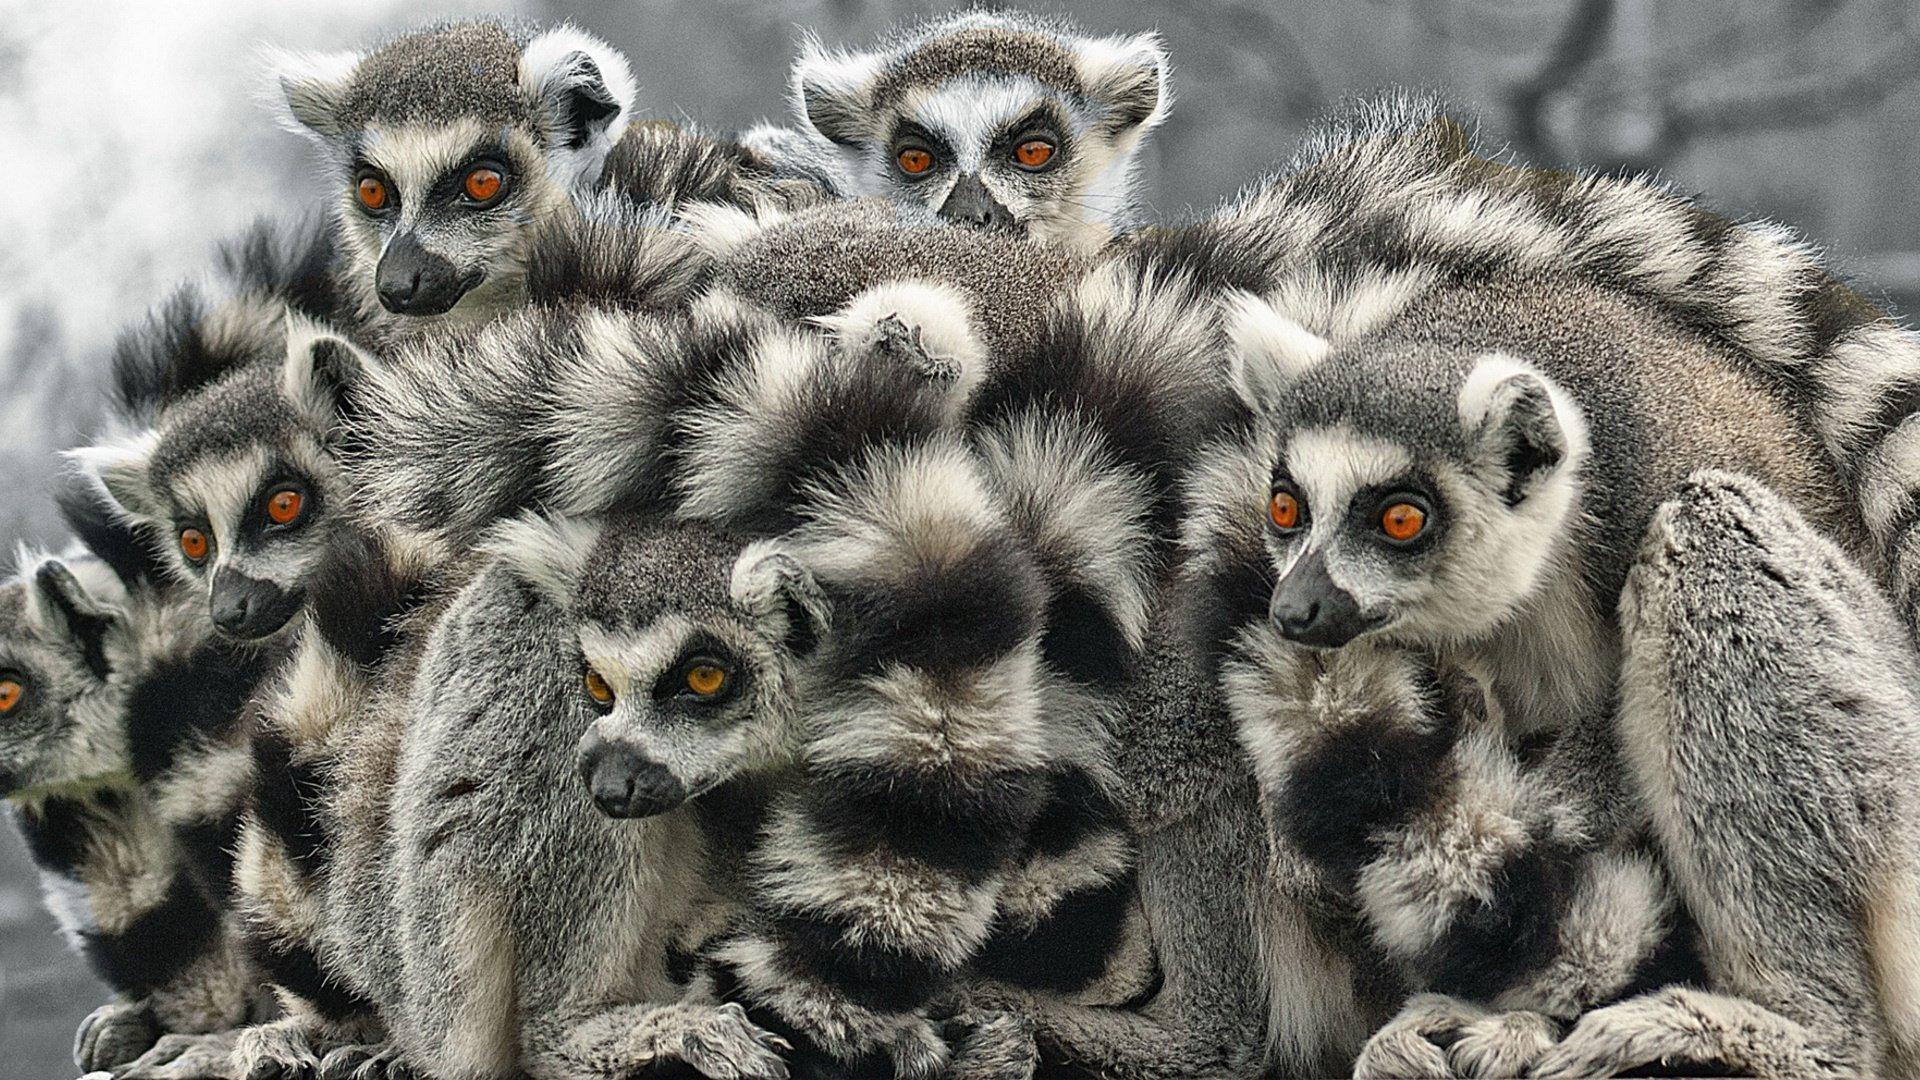 Great Lemur Wallpaper - thumb-1920-374004  Gallery_611651.jpg